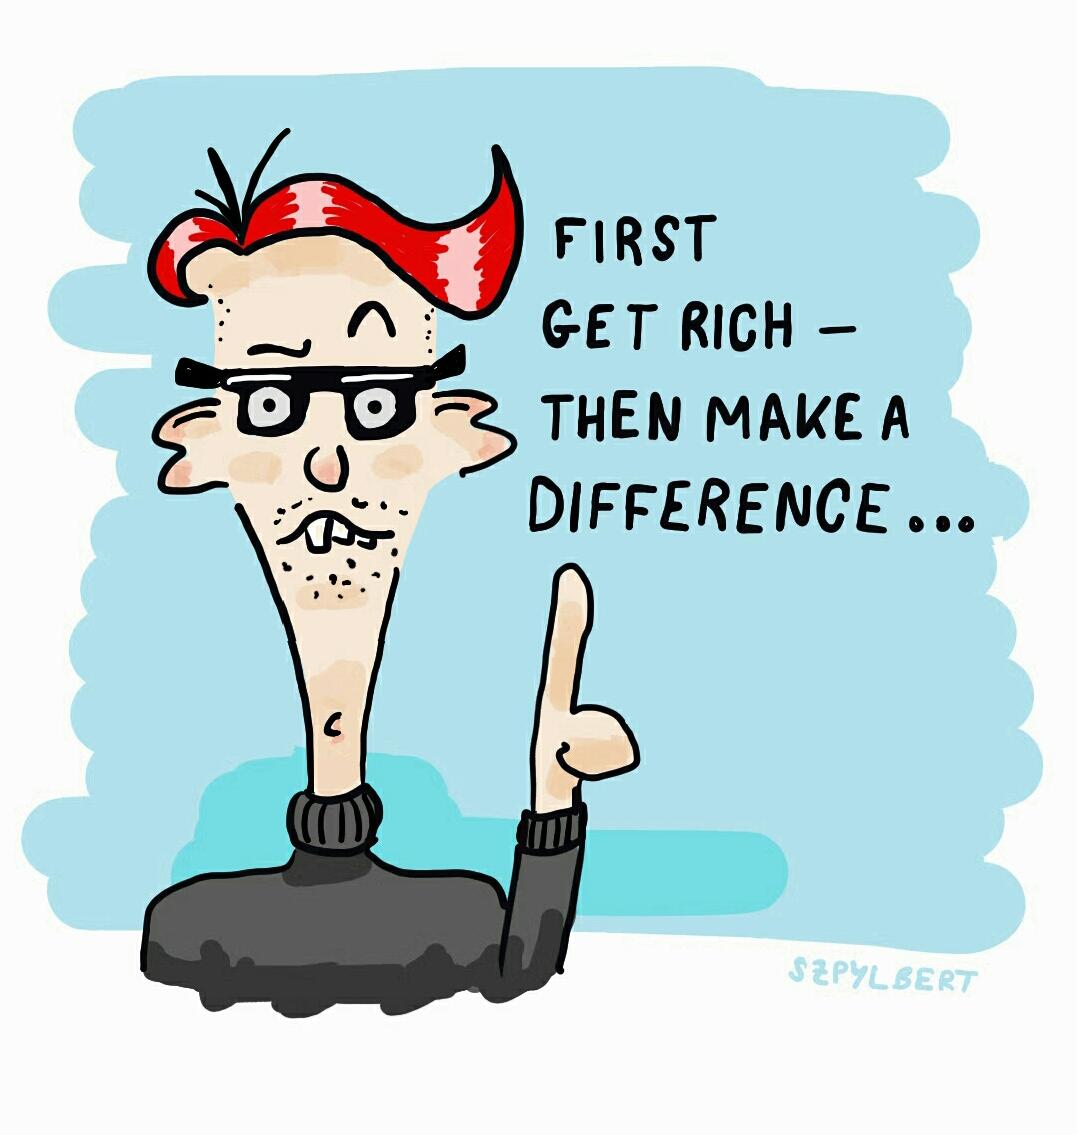 Szpylbert cartoon about the morale of entrepreneurs